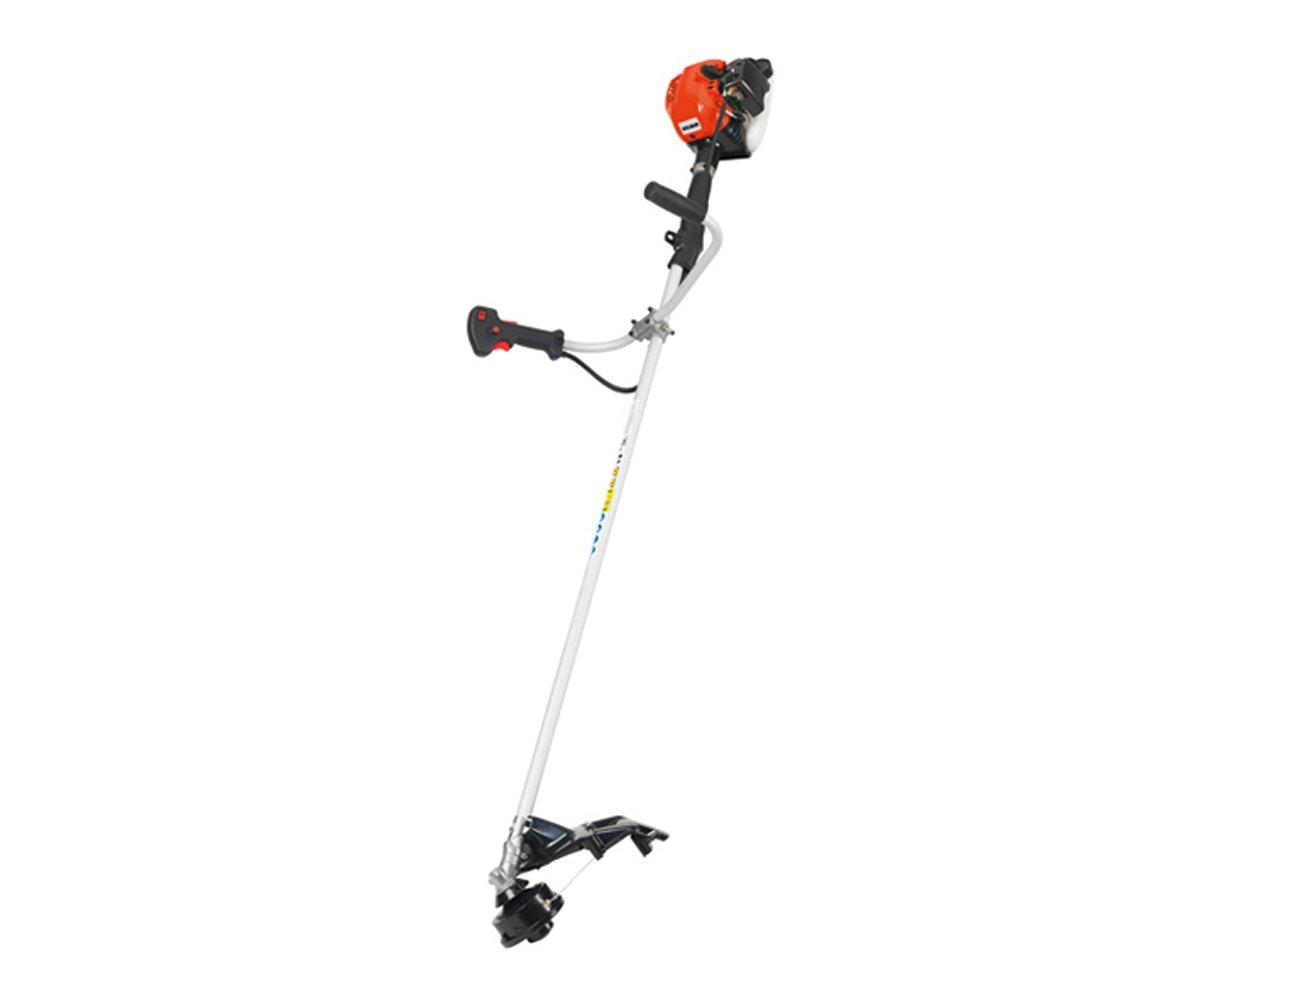 Dolmar-701024200-Benzin-Sense-Messer